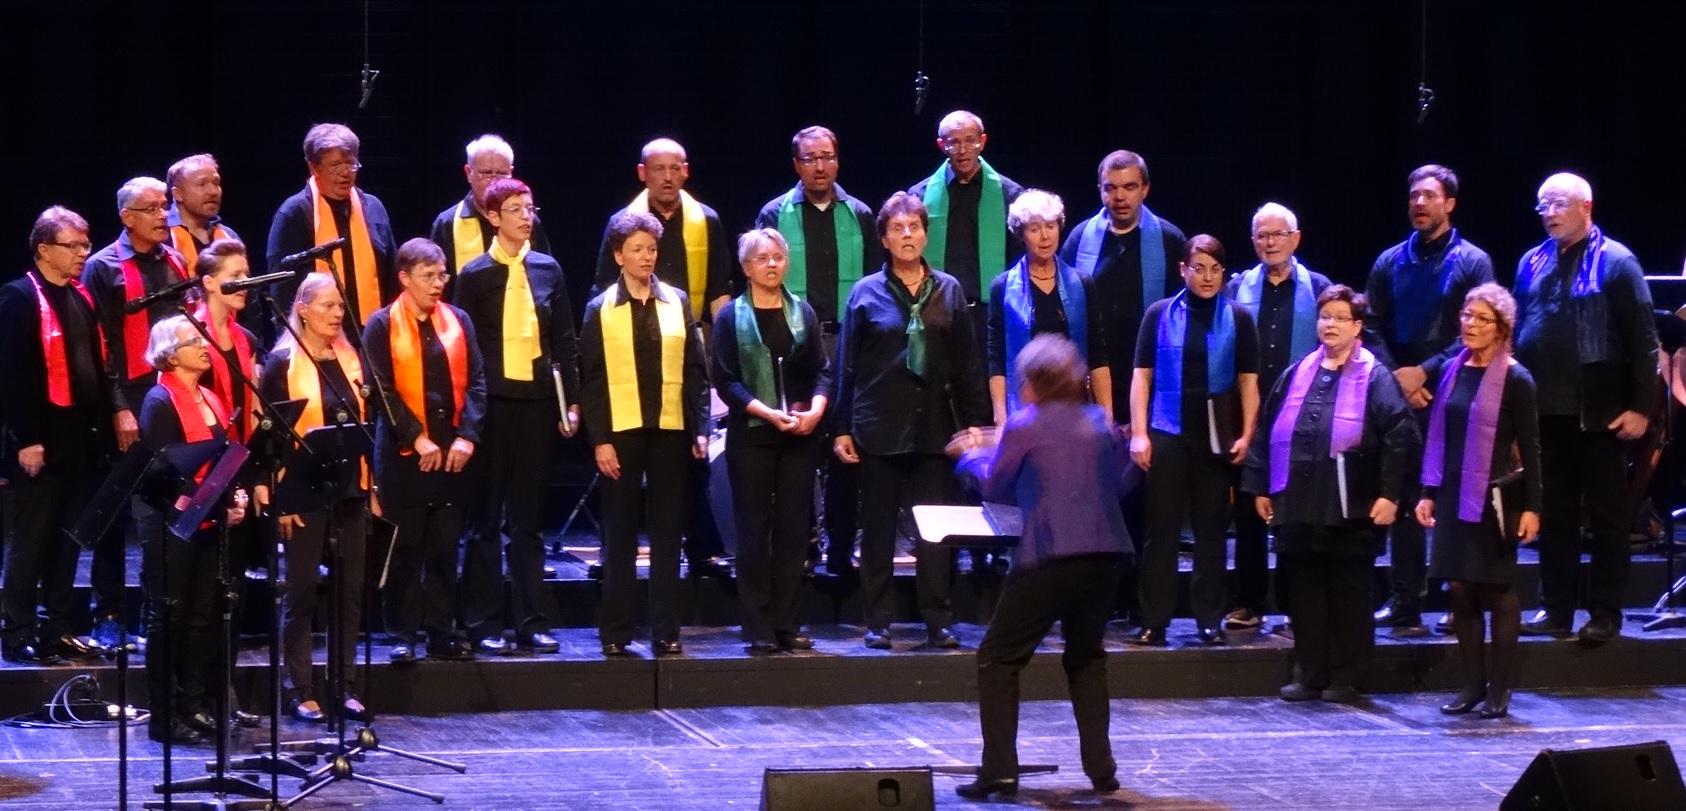 Regenbogenchor München